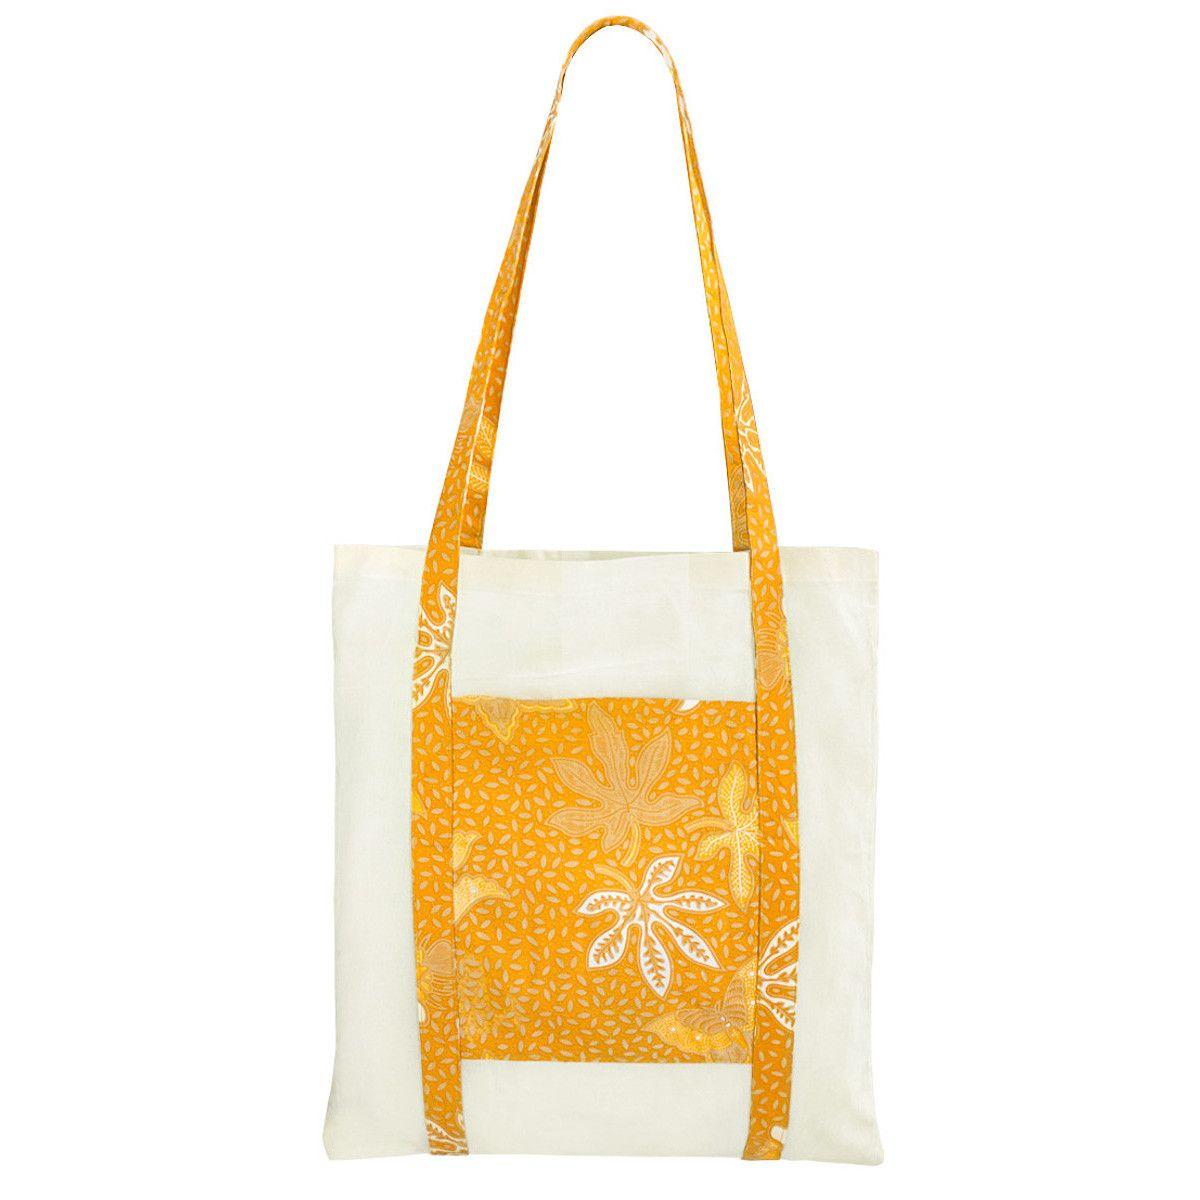 Tote bag sac coton imprimé jaune moutarde